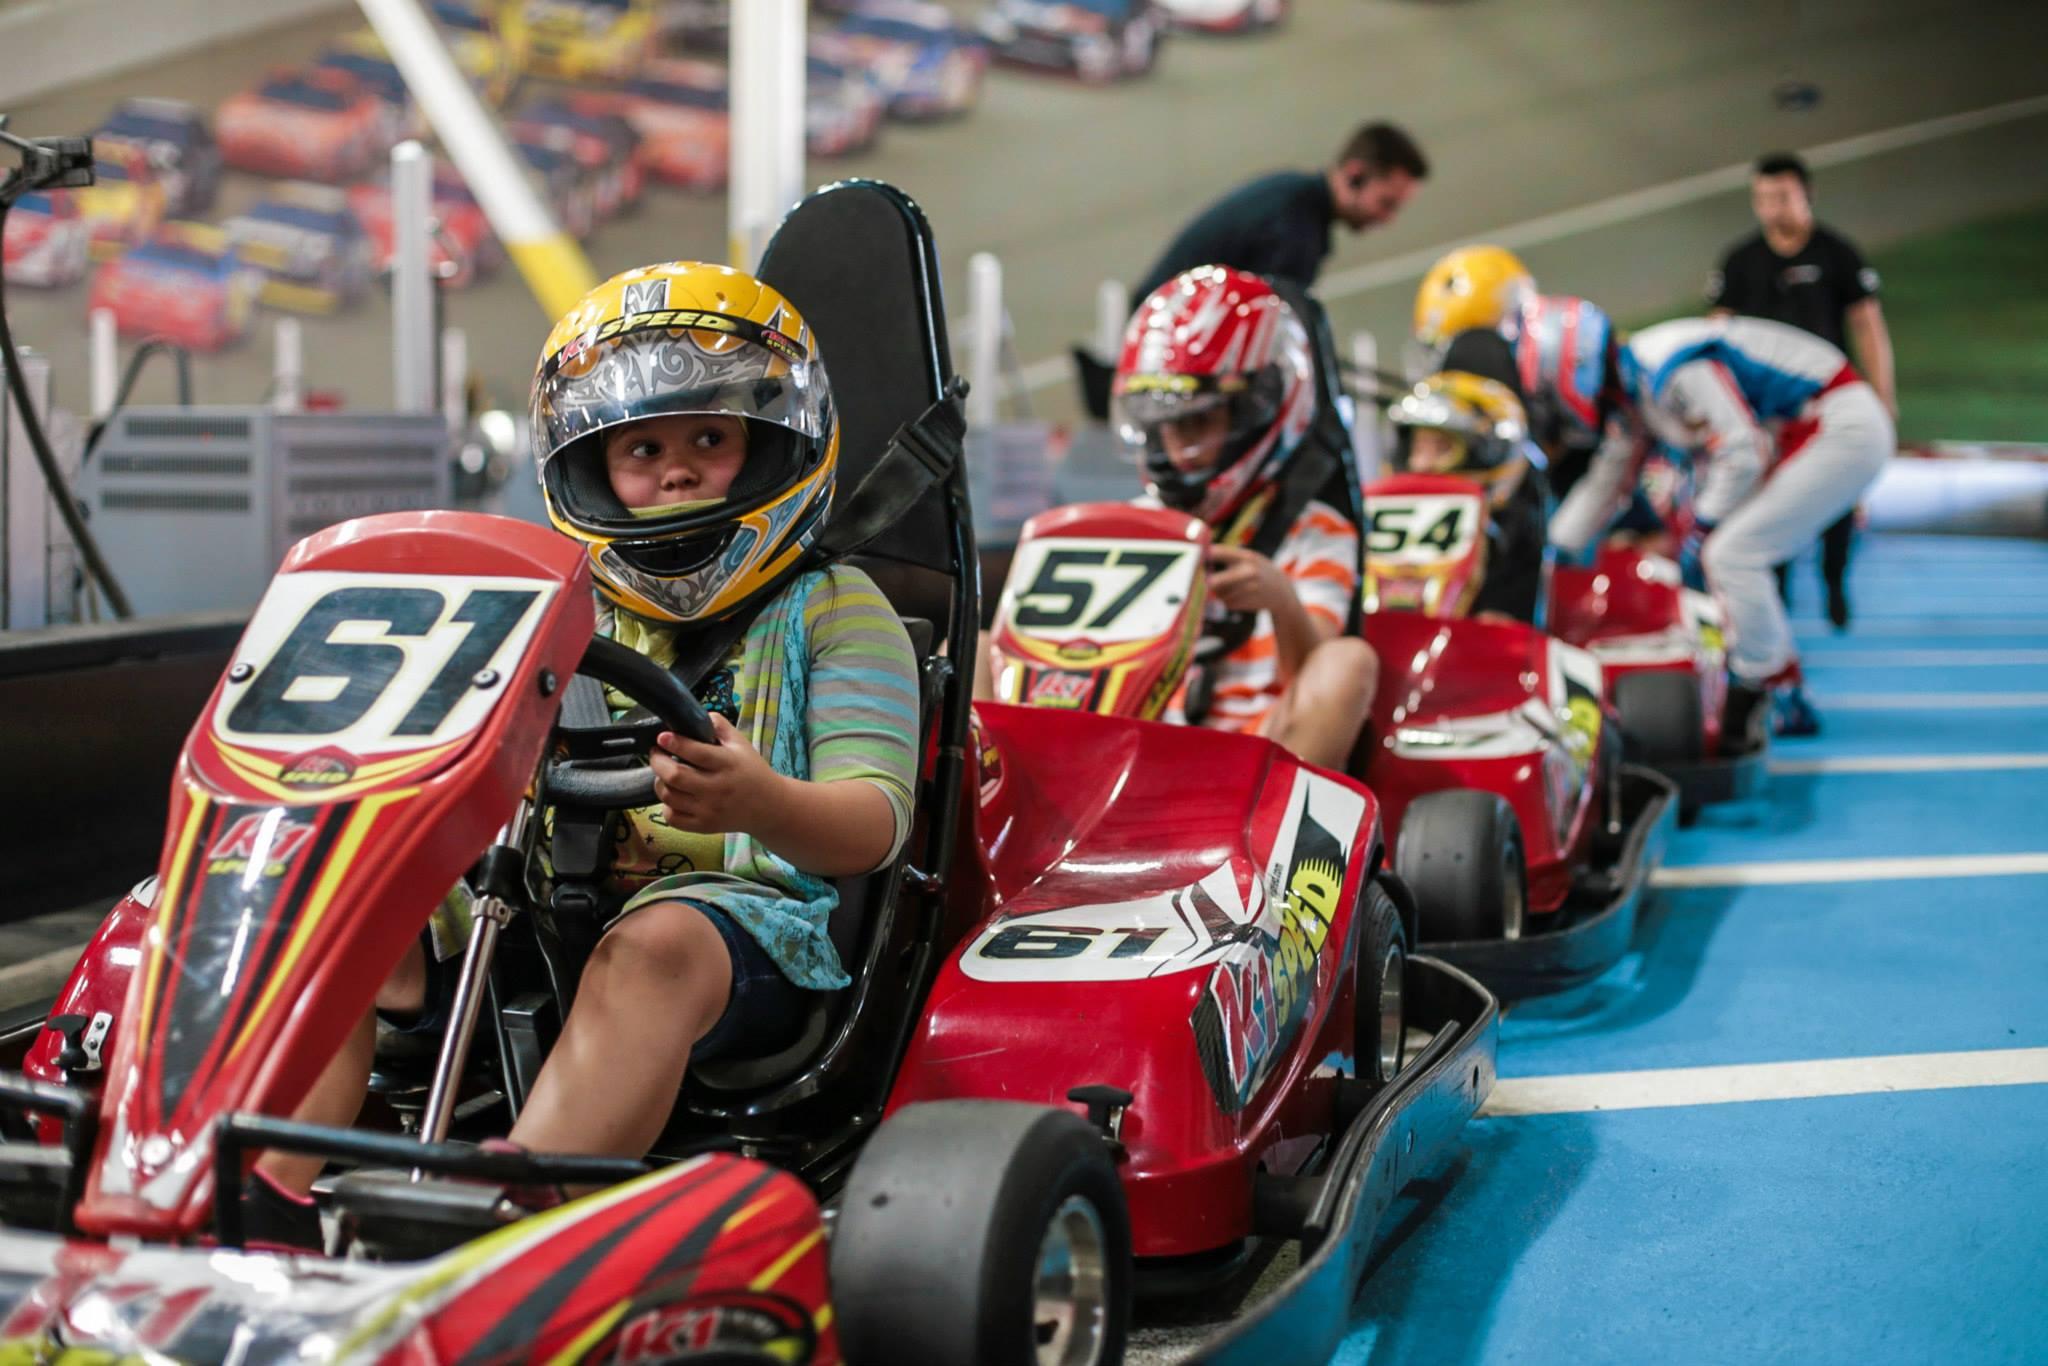 Junior Mini Grand Prix Birthday Party - Burbank - Image 1